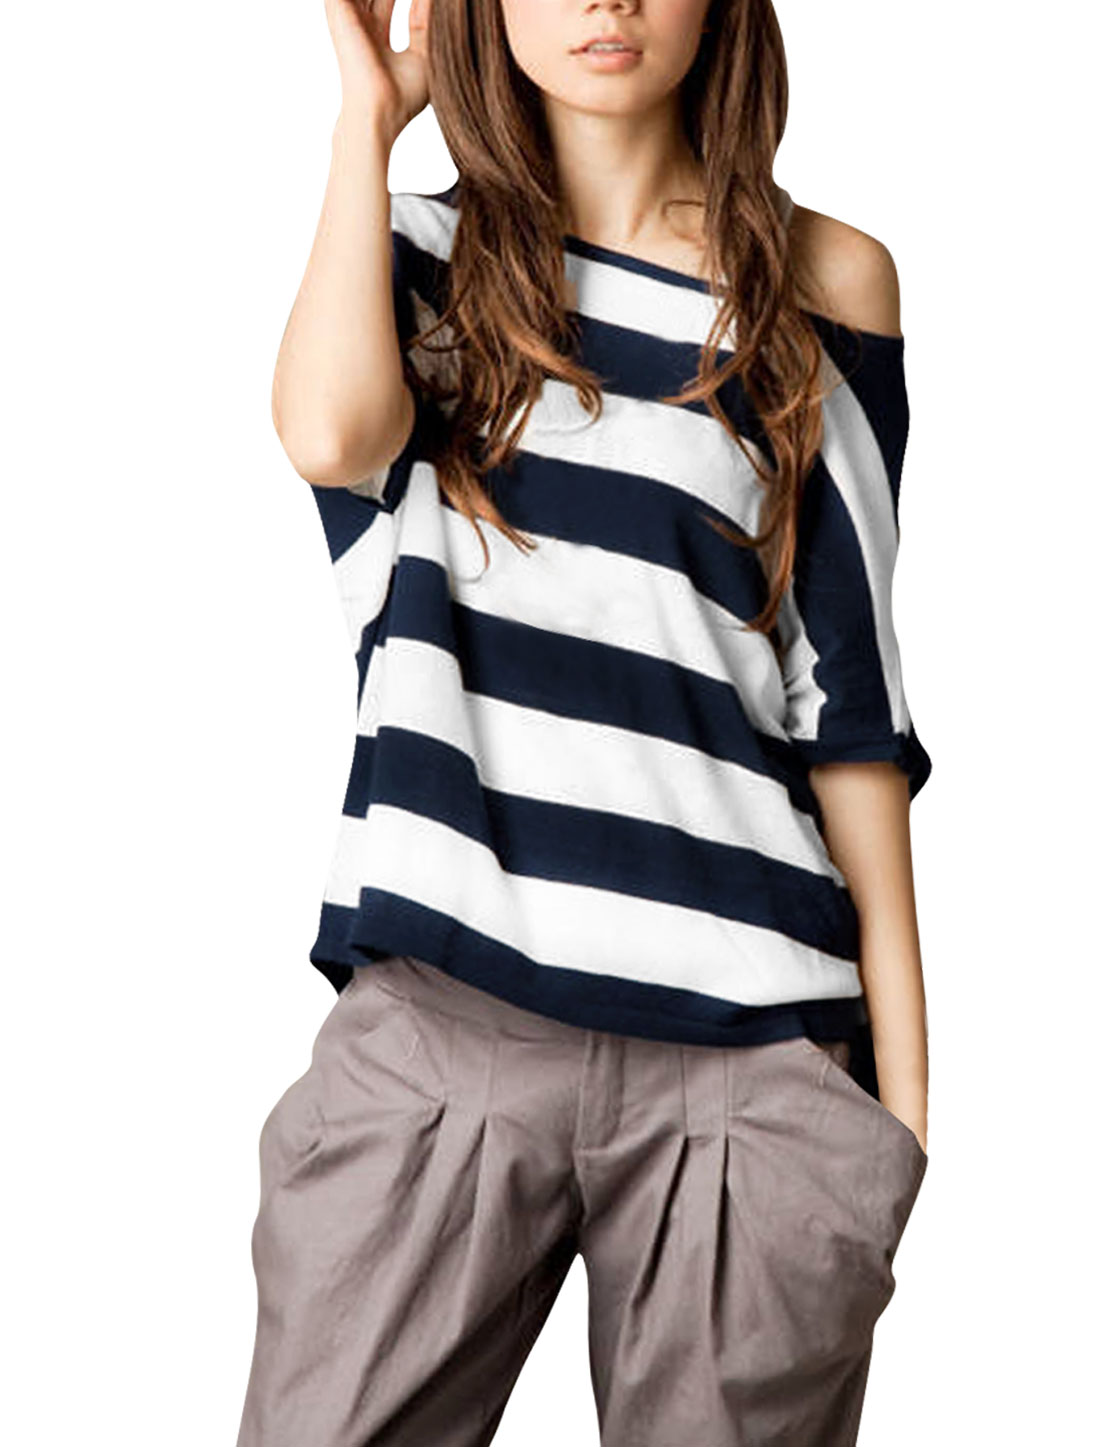 Lady Asymmetric Neck Dolman Sleeve Stripes Summer Shirt Dark Blue White 1X